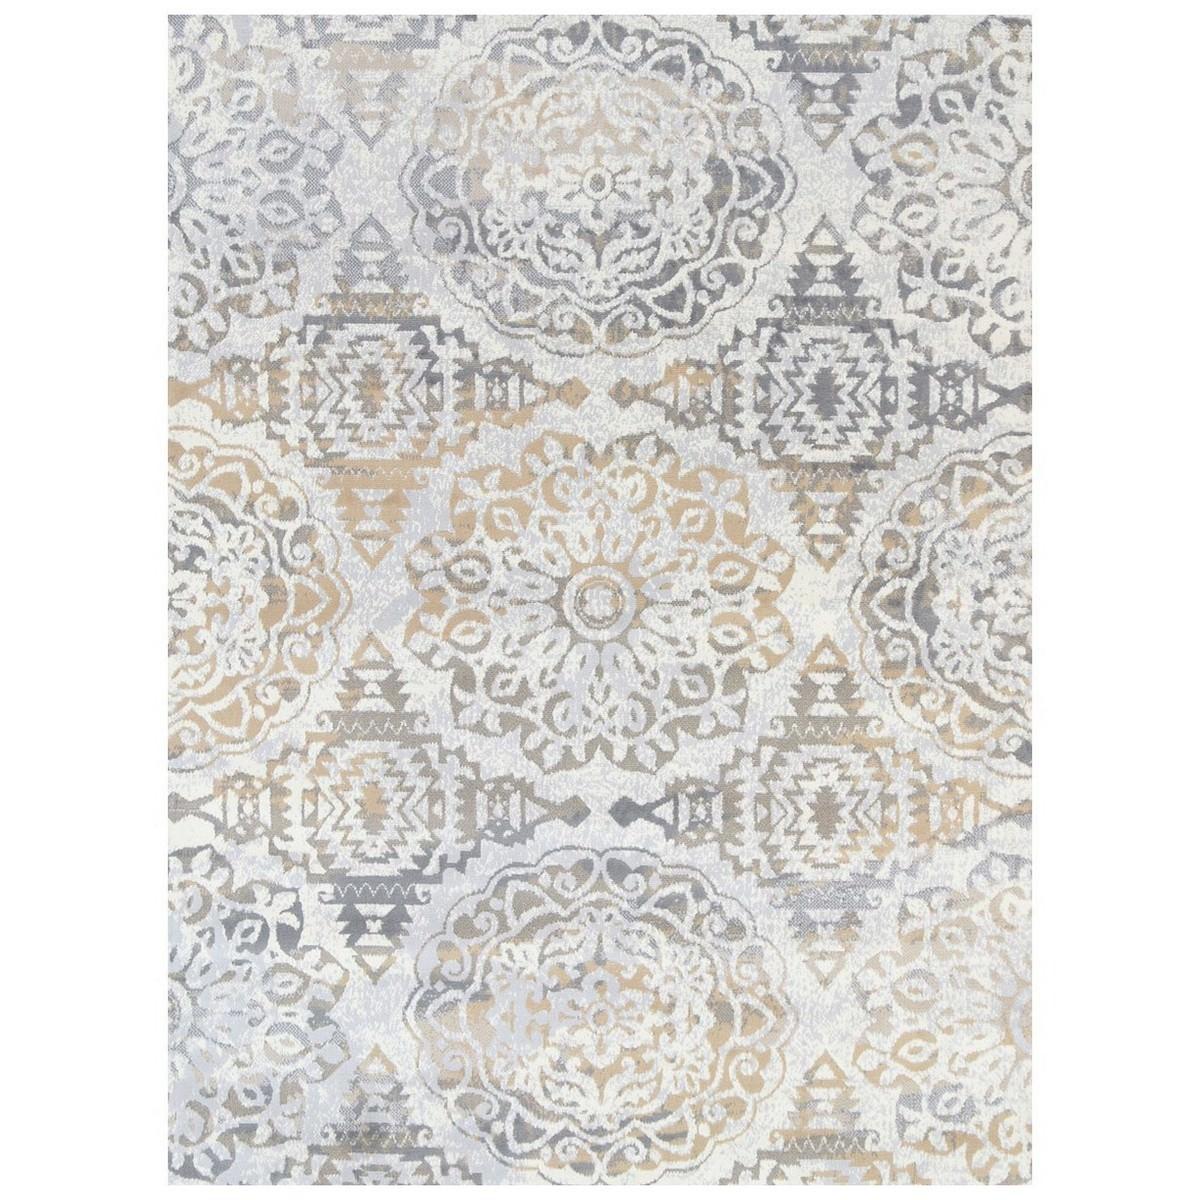 Allure Dilara Oriental Rug 160x230cm Beige Grey